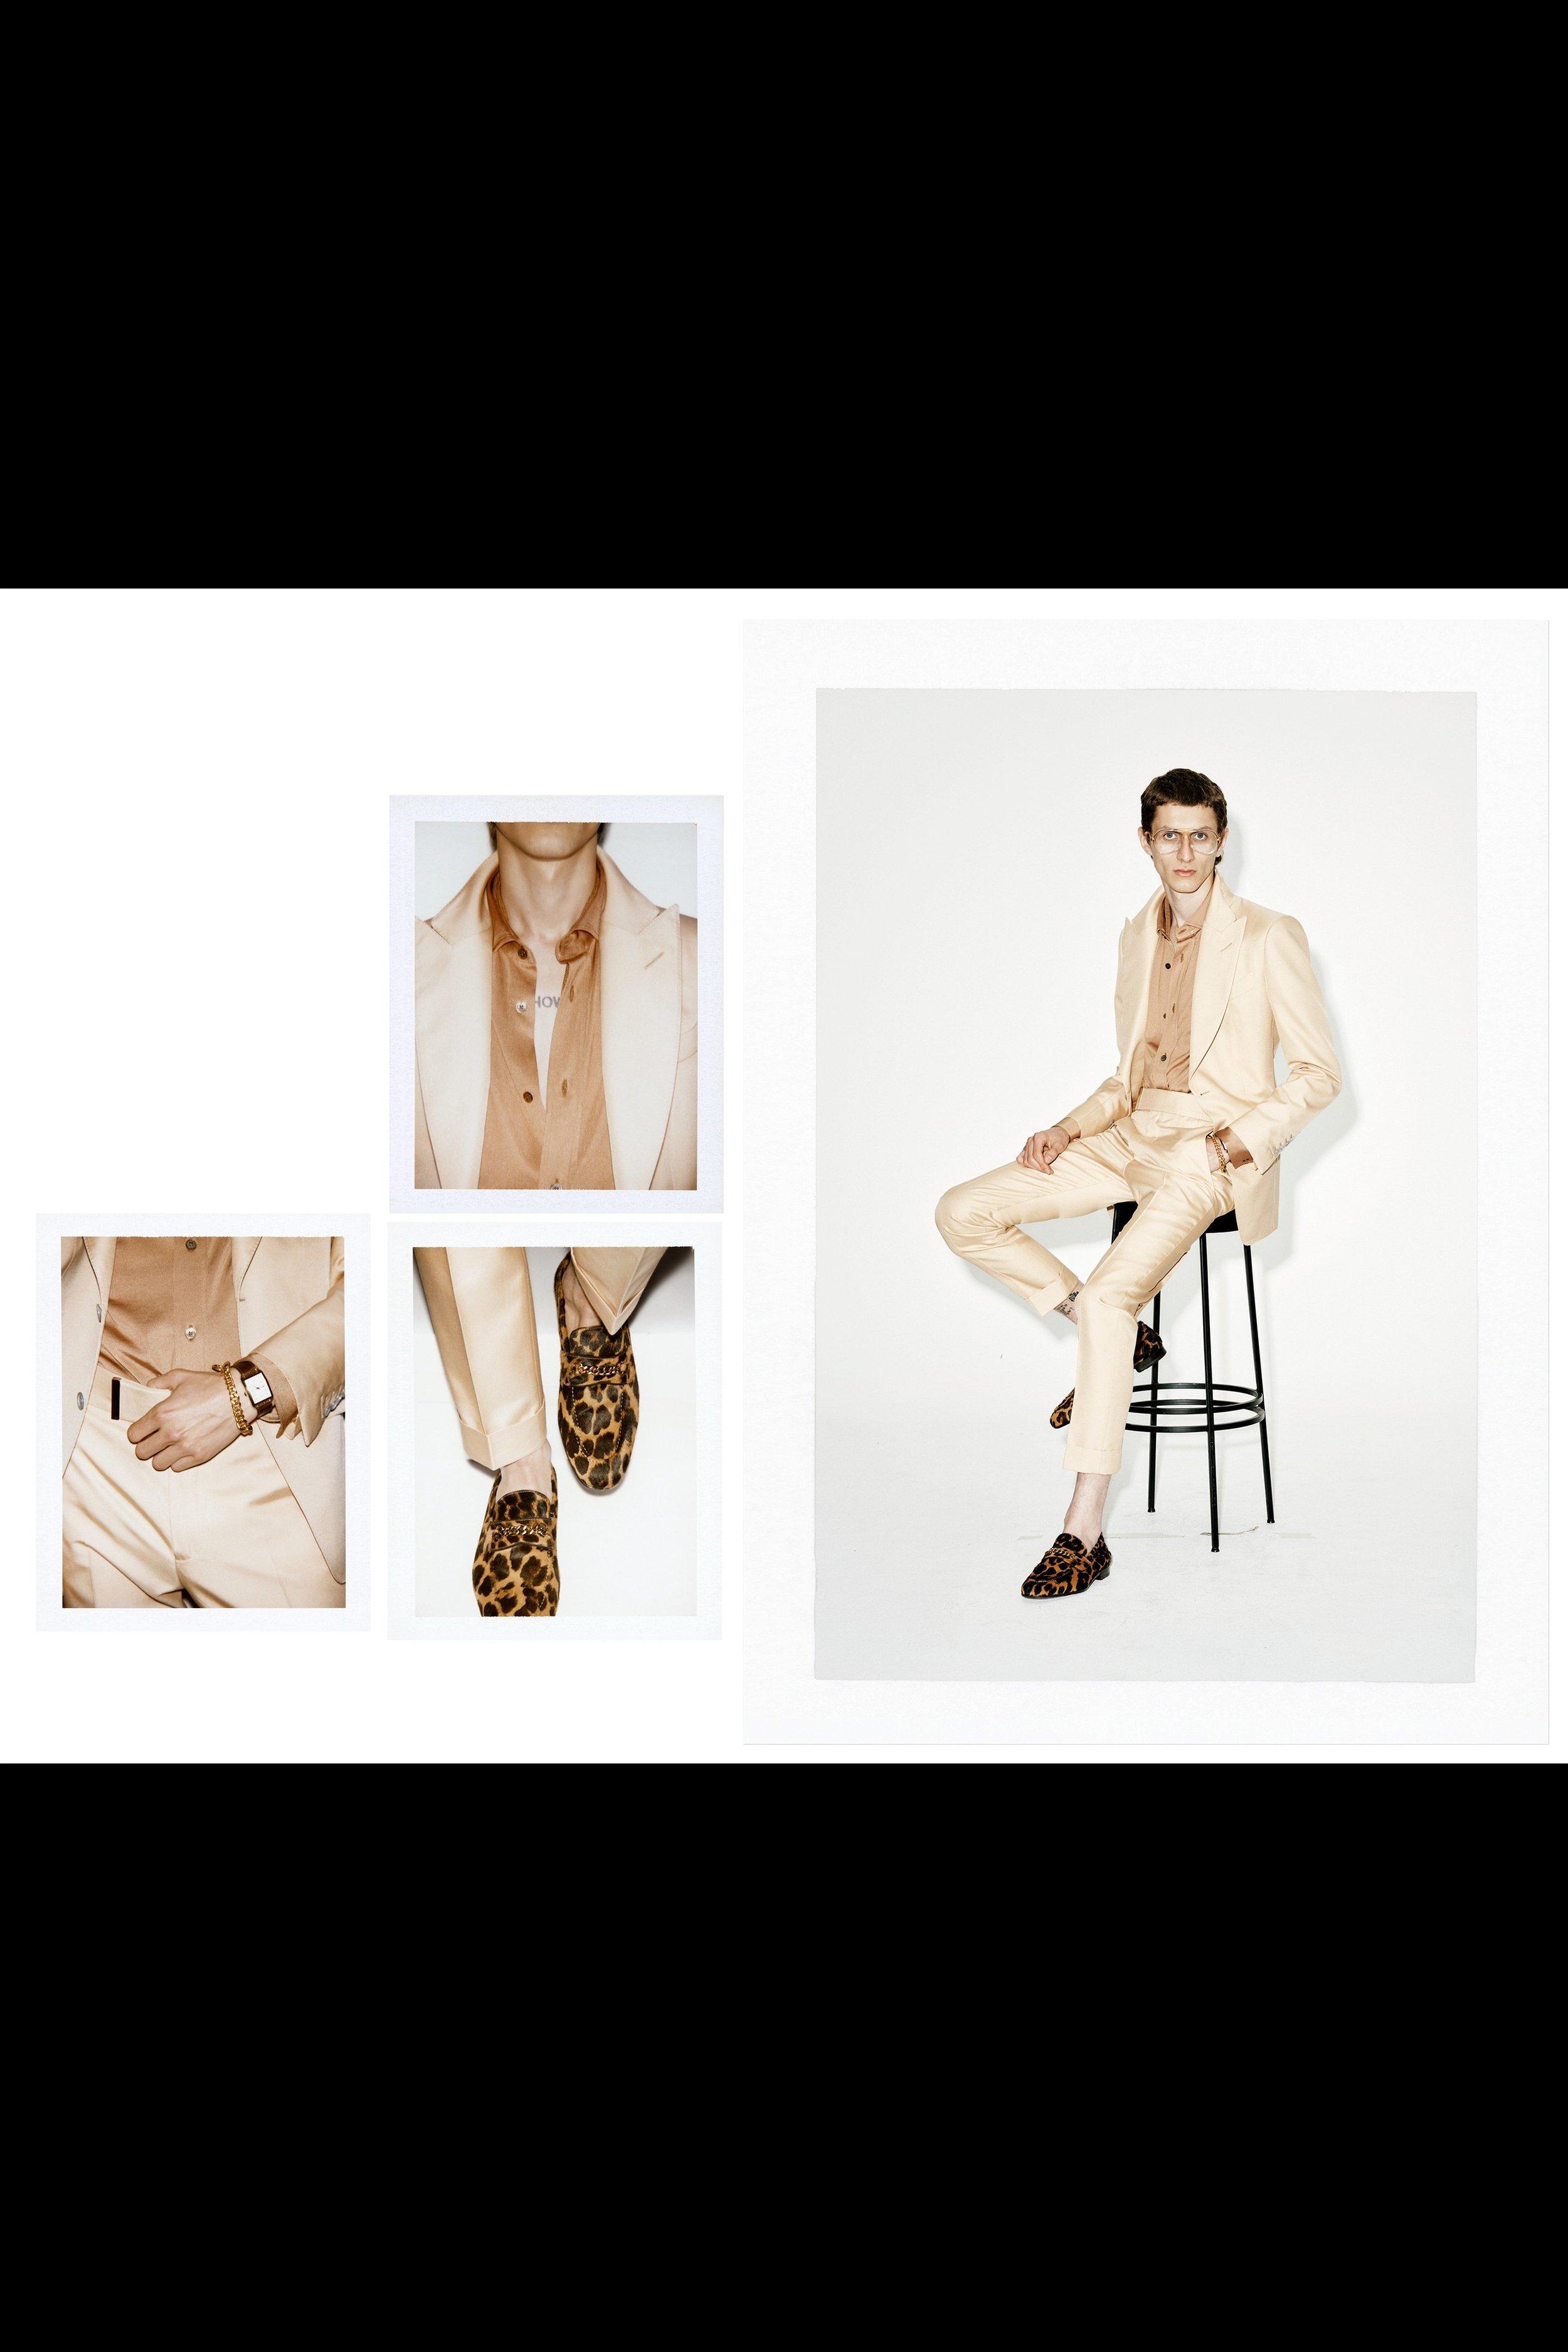 00016-Tom-Ford-vogue-menswear-spring-2019-pr.jpg